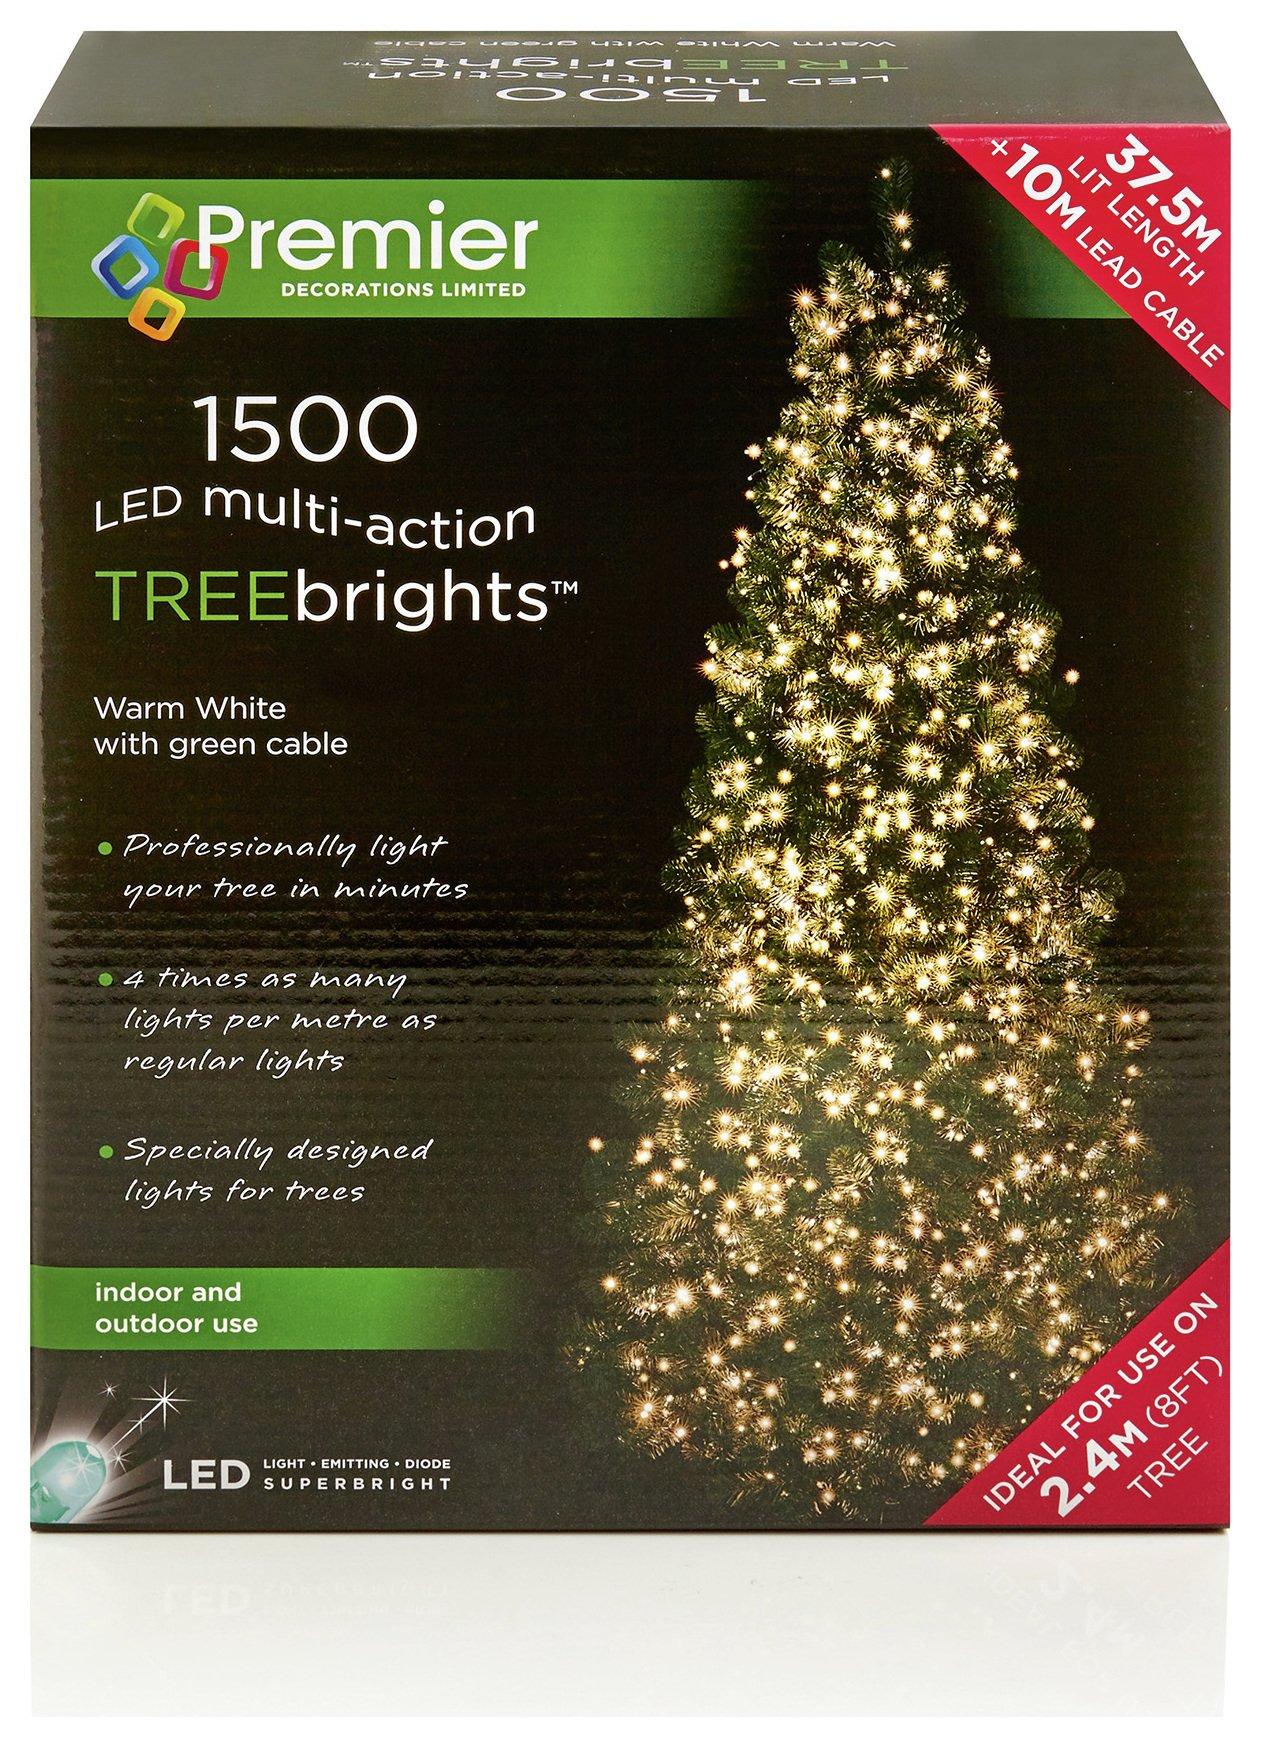 1500 LED Treebrite Lights - Warm White.